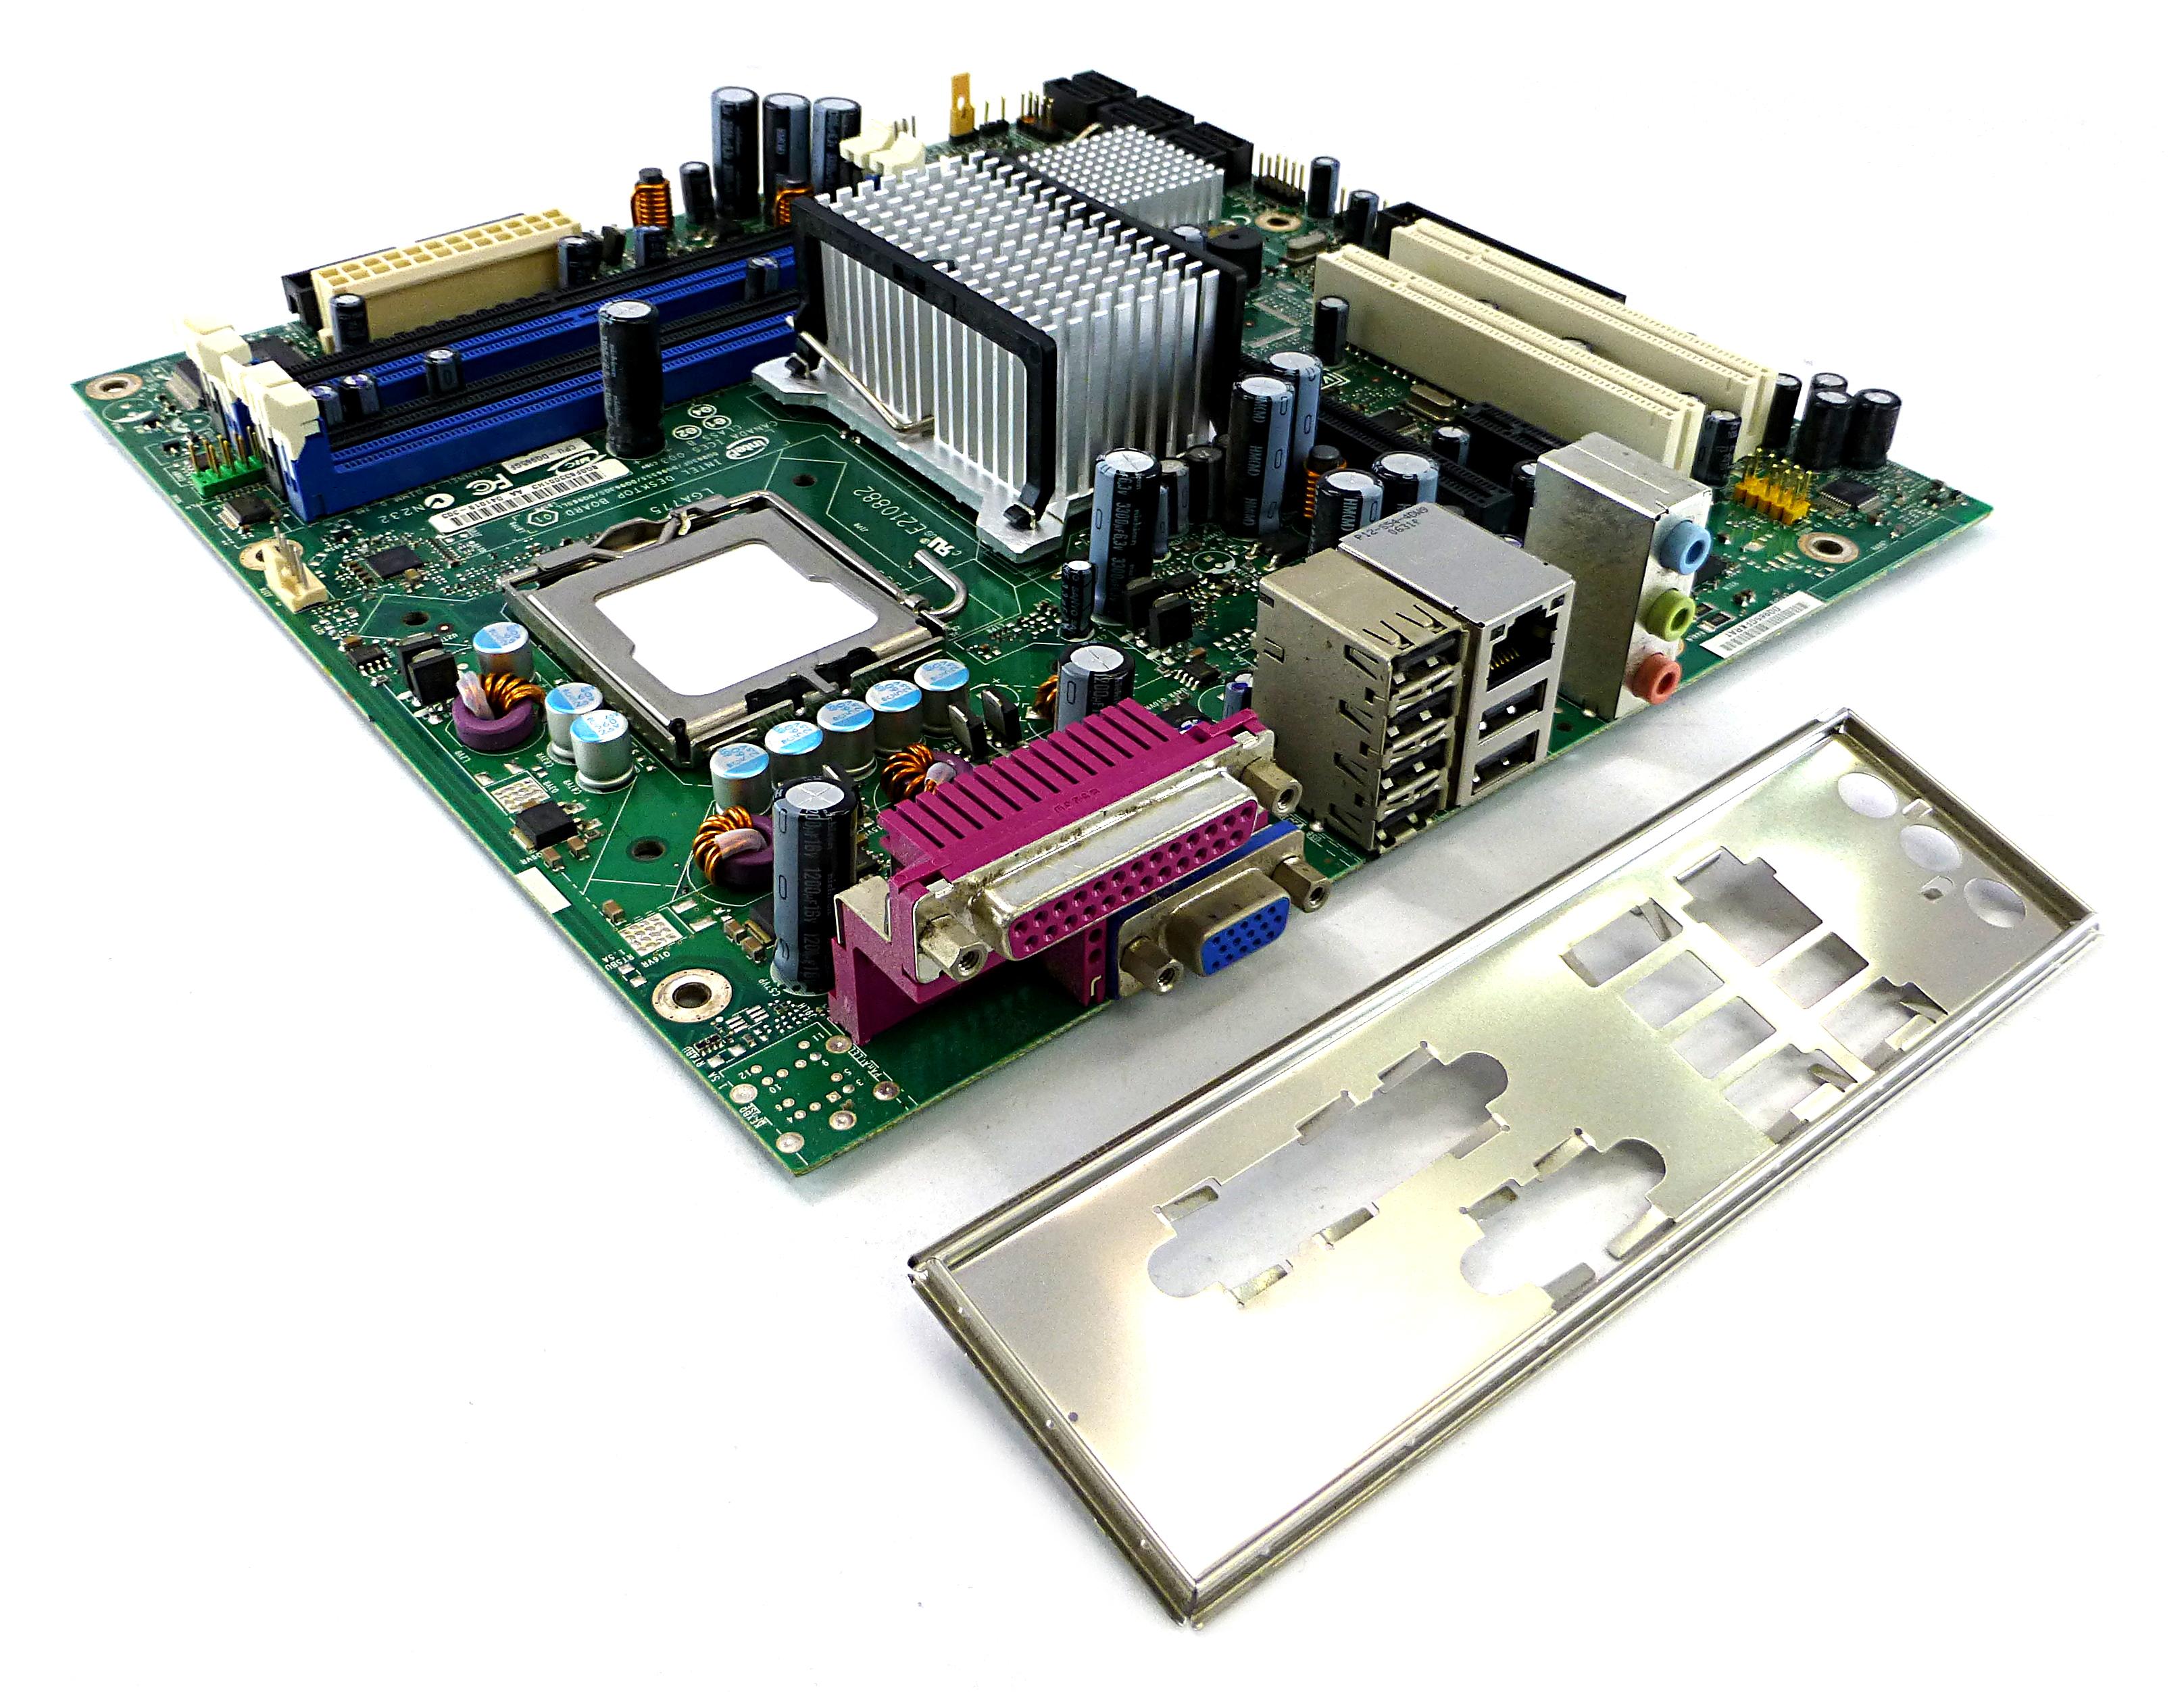 DQ965GFKRA1 Intel Socket 775 Motherboard D41019-303